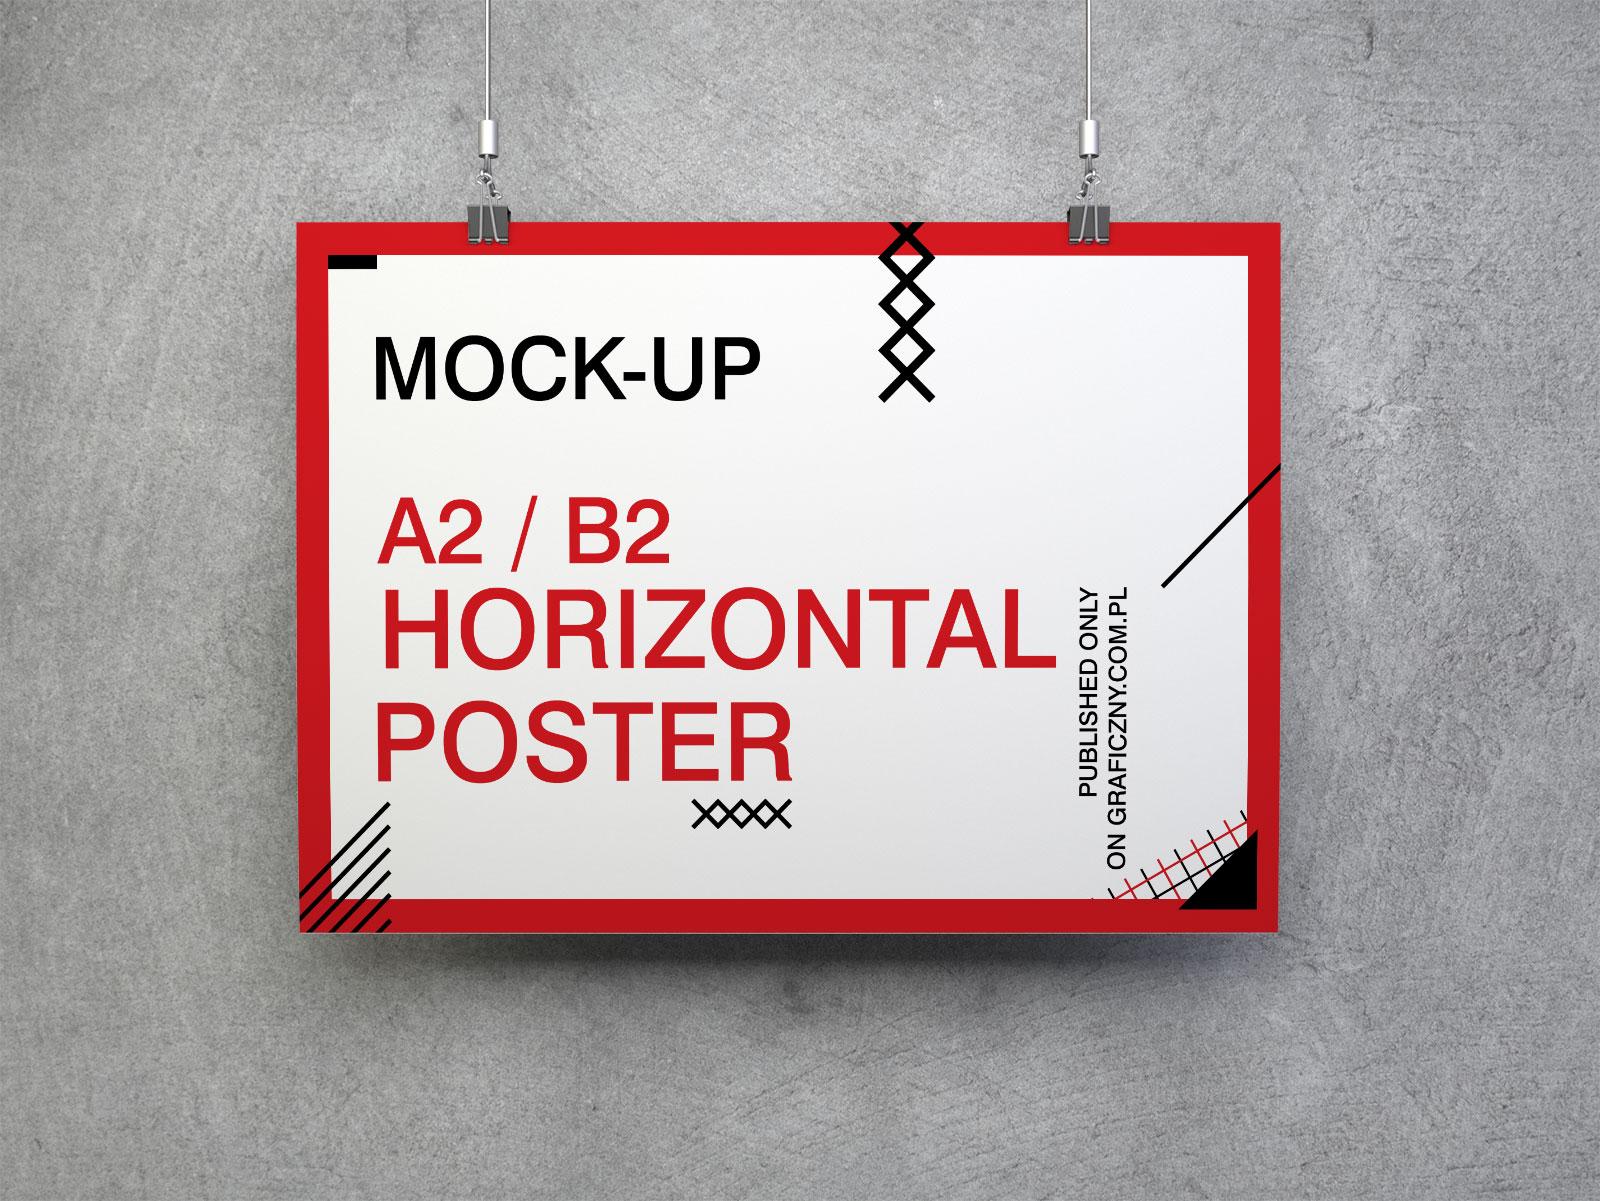 Free-Horizontal-Poster-Mockup-PSD